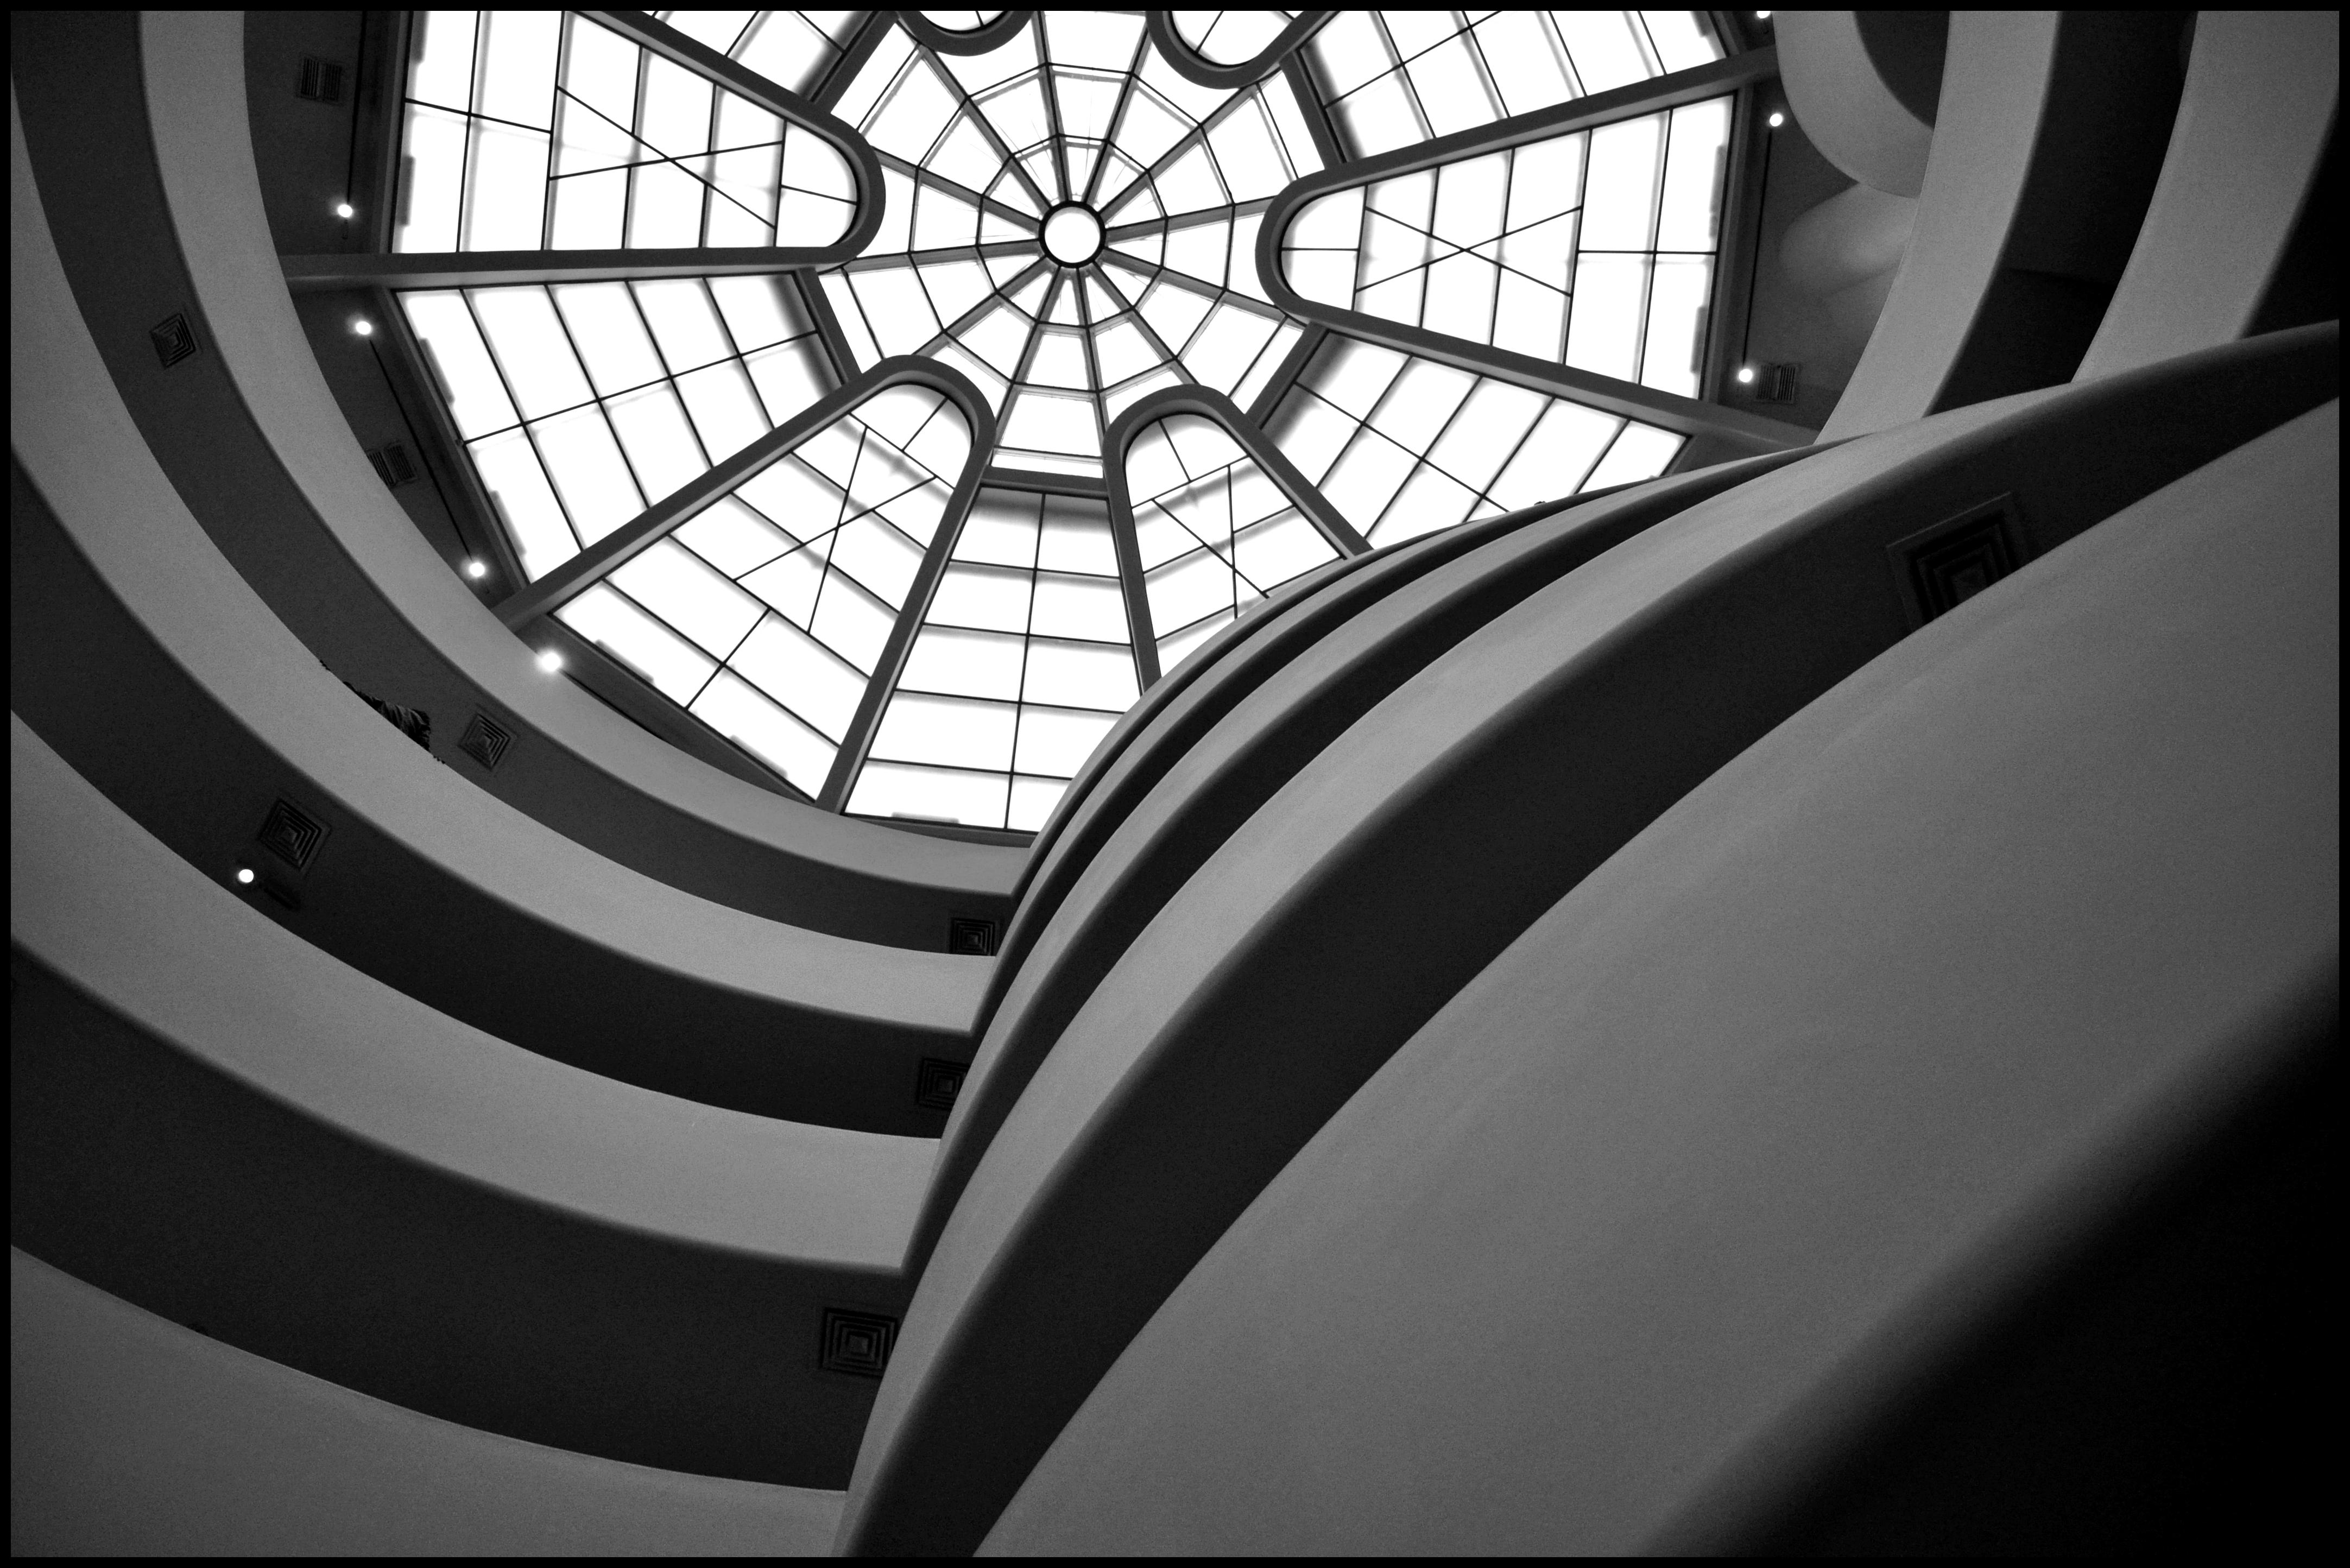 Guggenheim Museum interior looking up